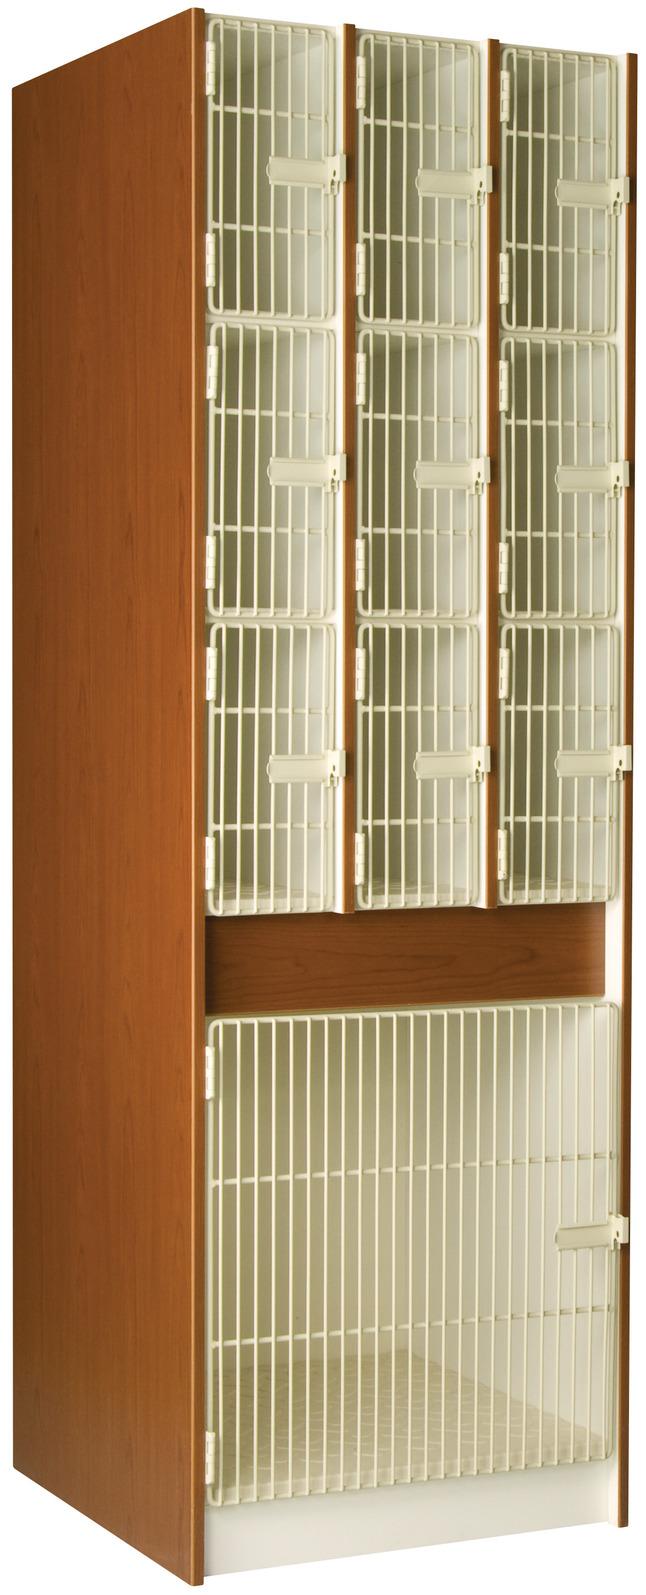 Instrument Storage, Item Number 1367410